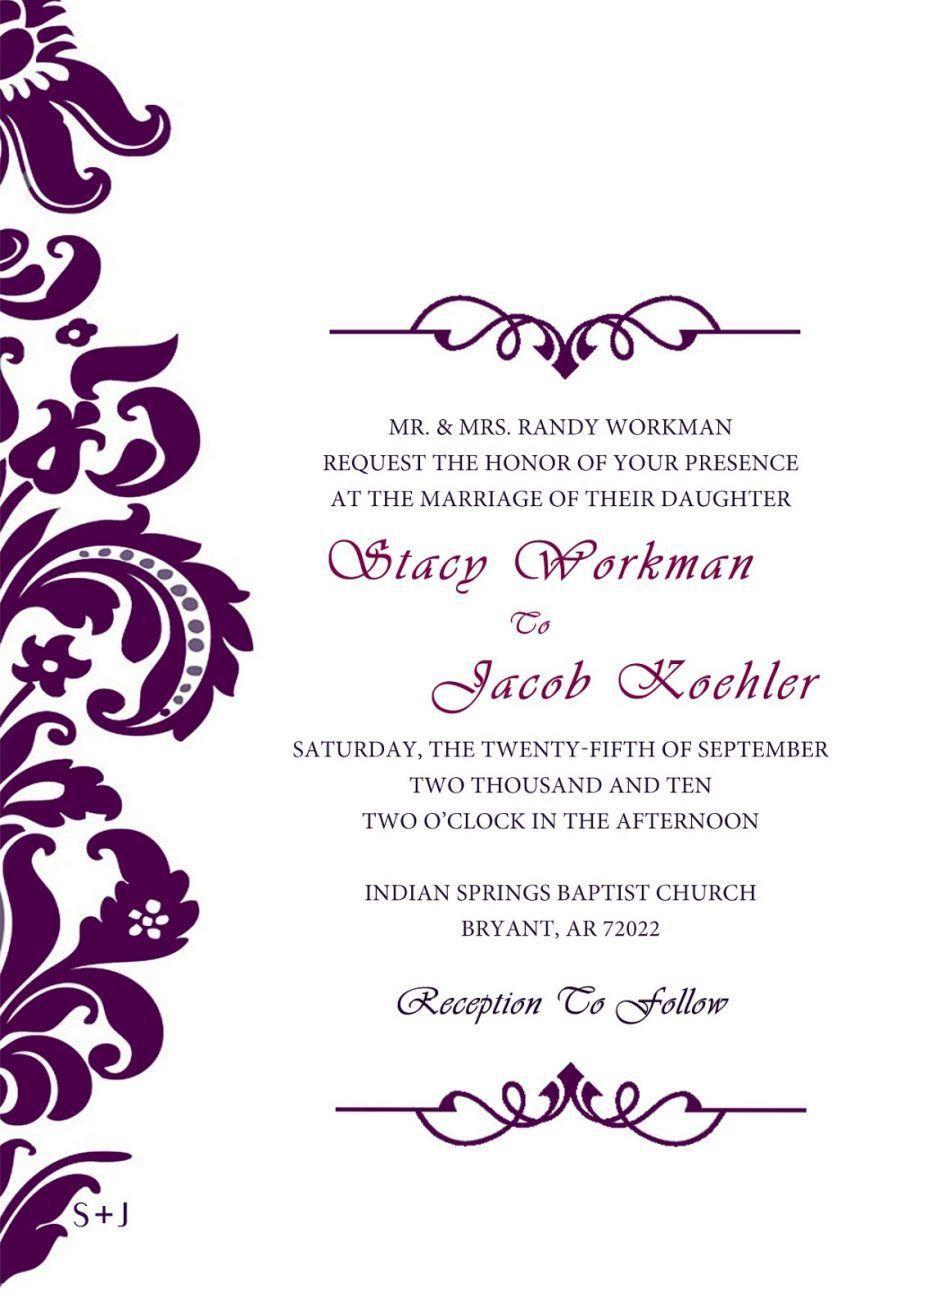 Formal Invitation Templates Free Download